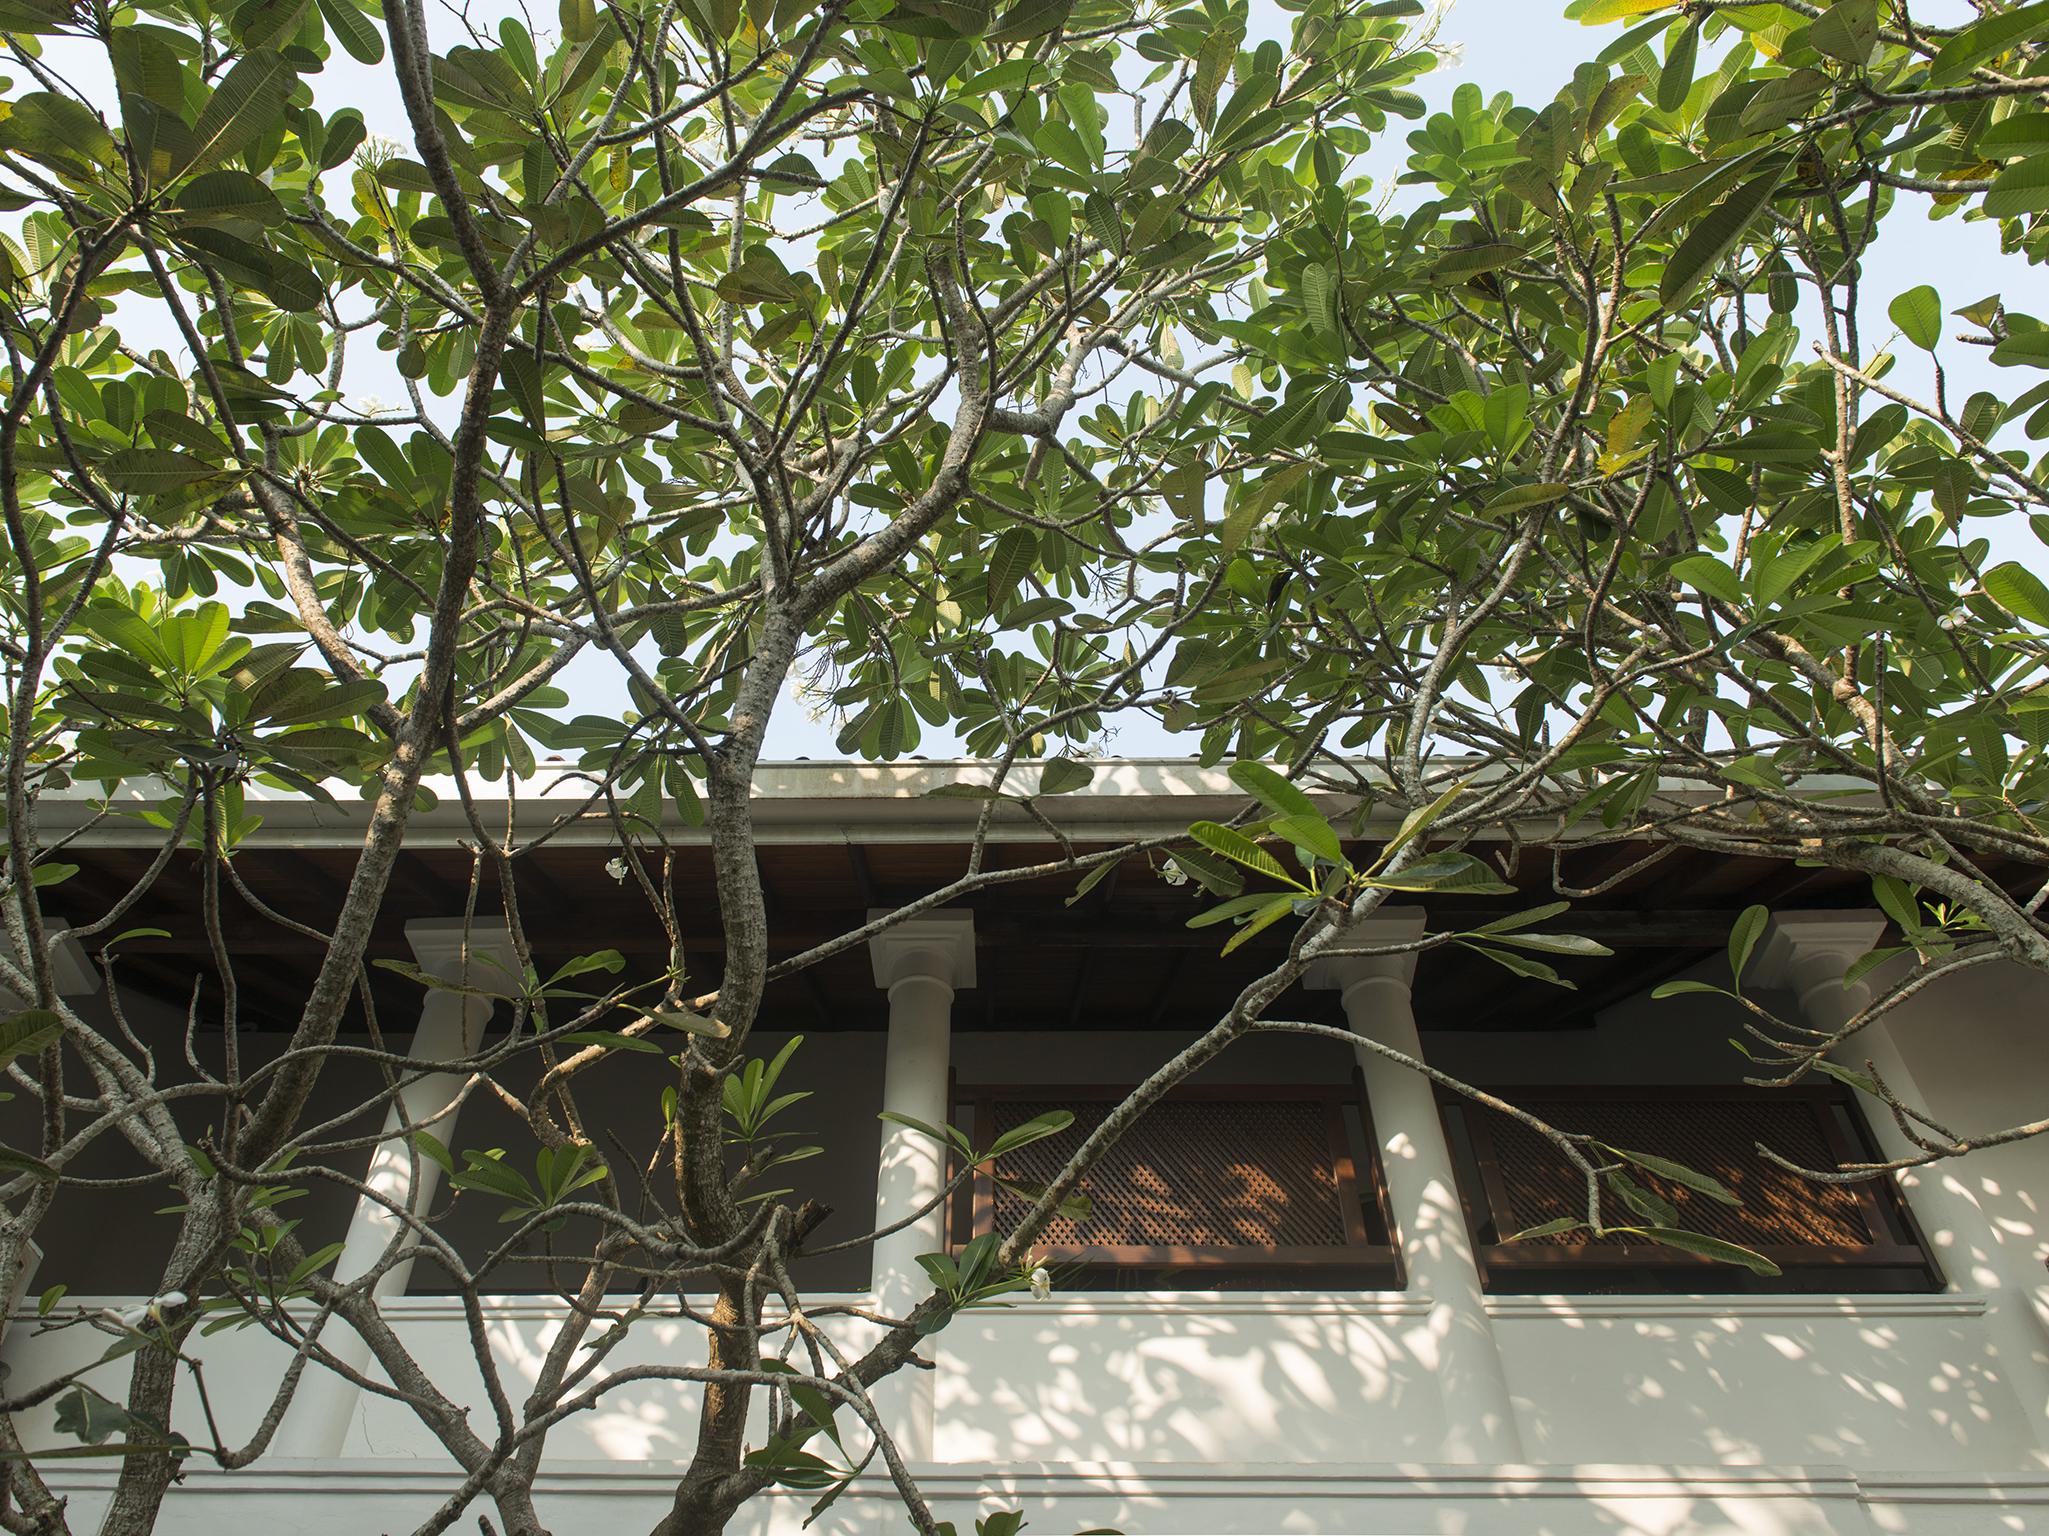 19-Ambassadors House-Galle - Courtyard tree canopy.jpg